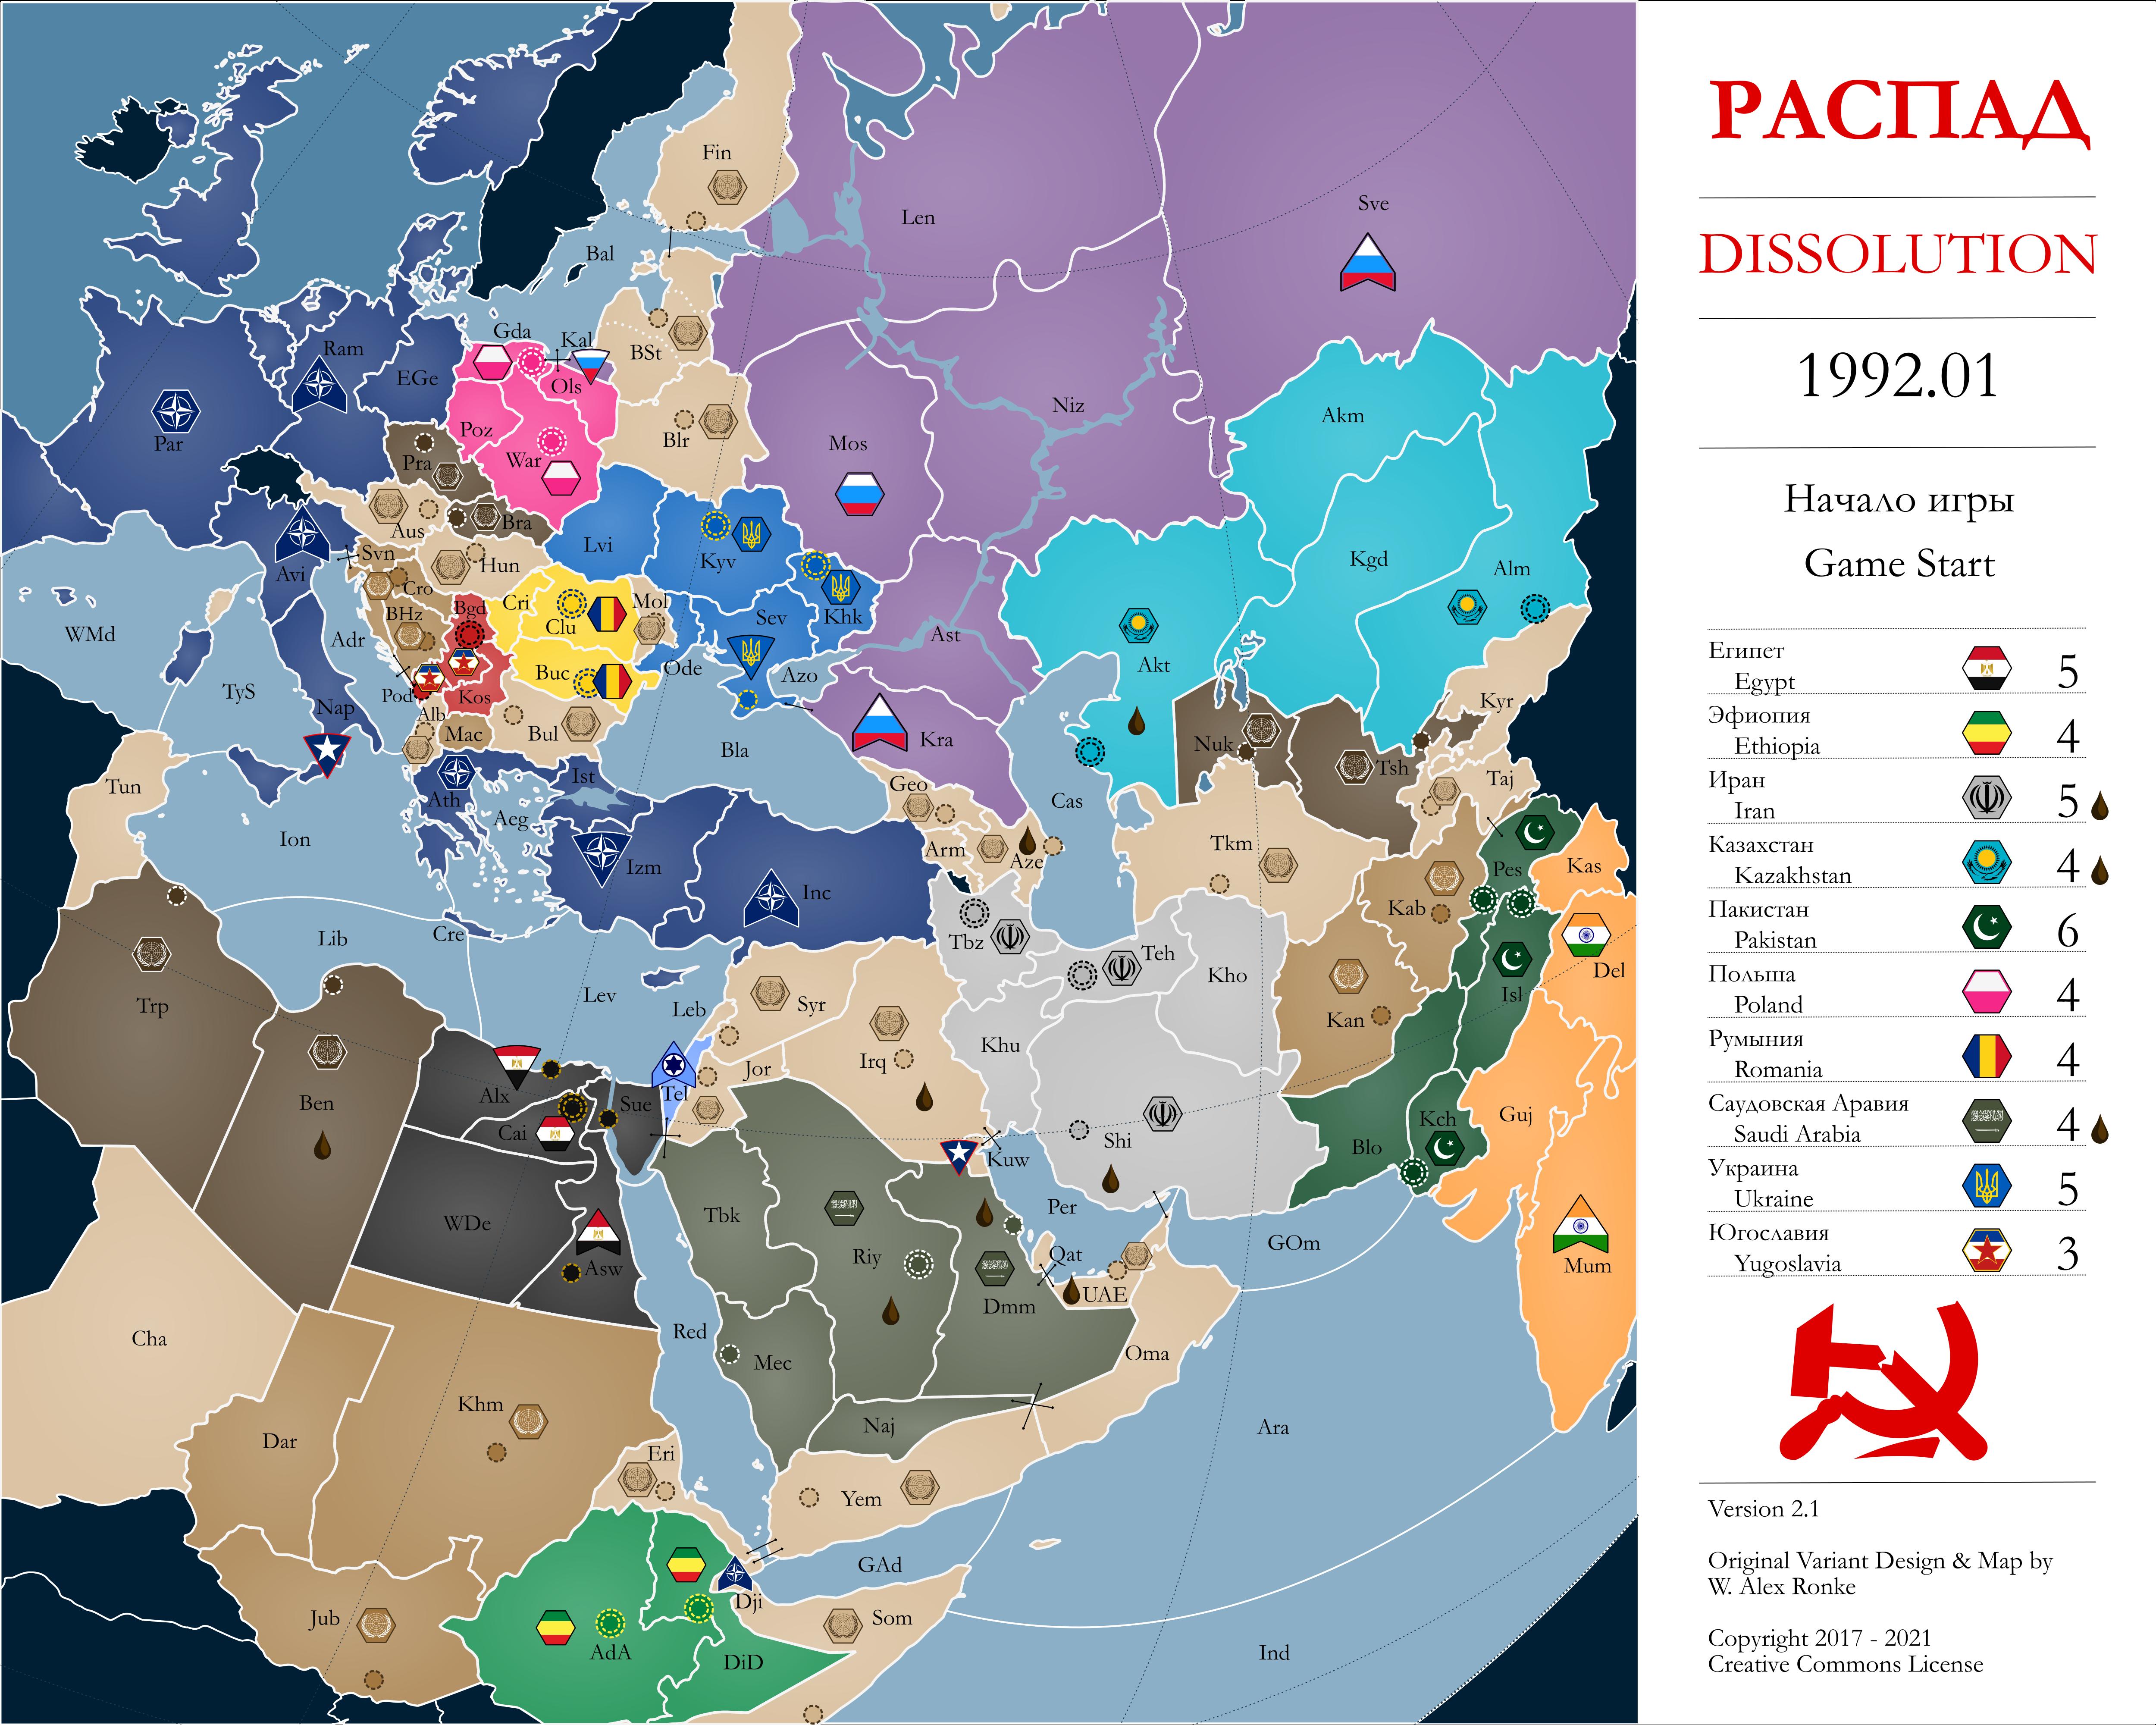 Dissolution v2.1 - Starting Geographic Map